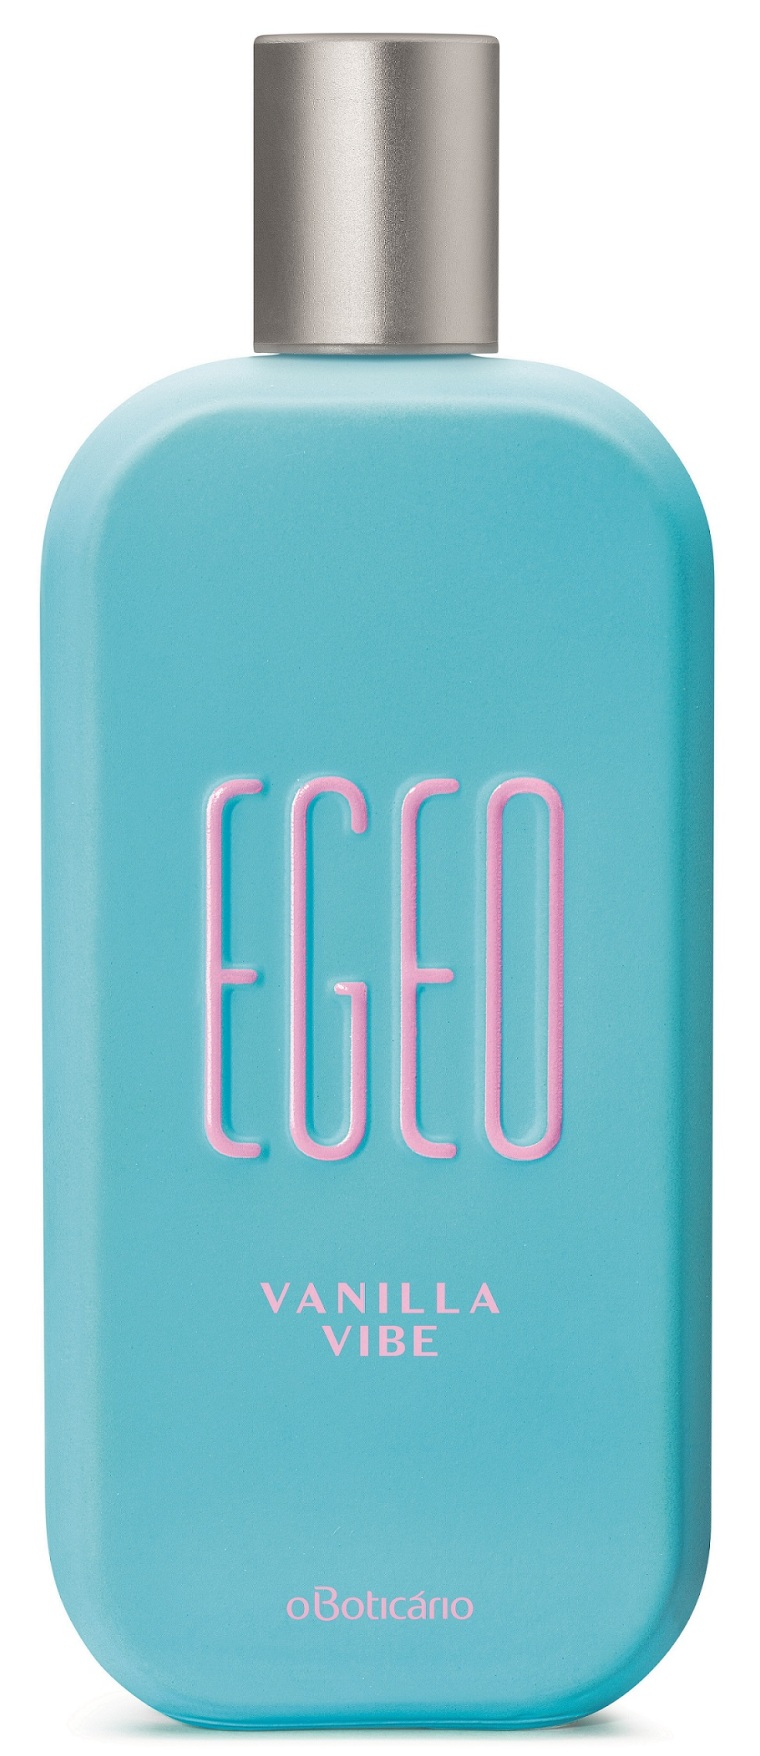 Egeo Vanilla Vibe Desodorante Colônia, 90 ml PreçoR�99,90